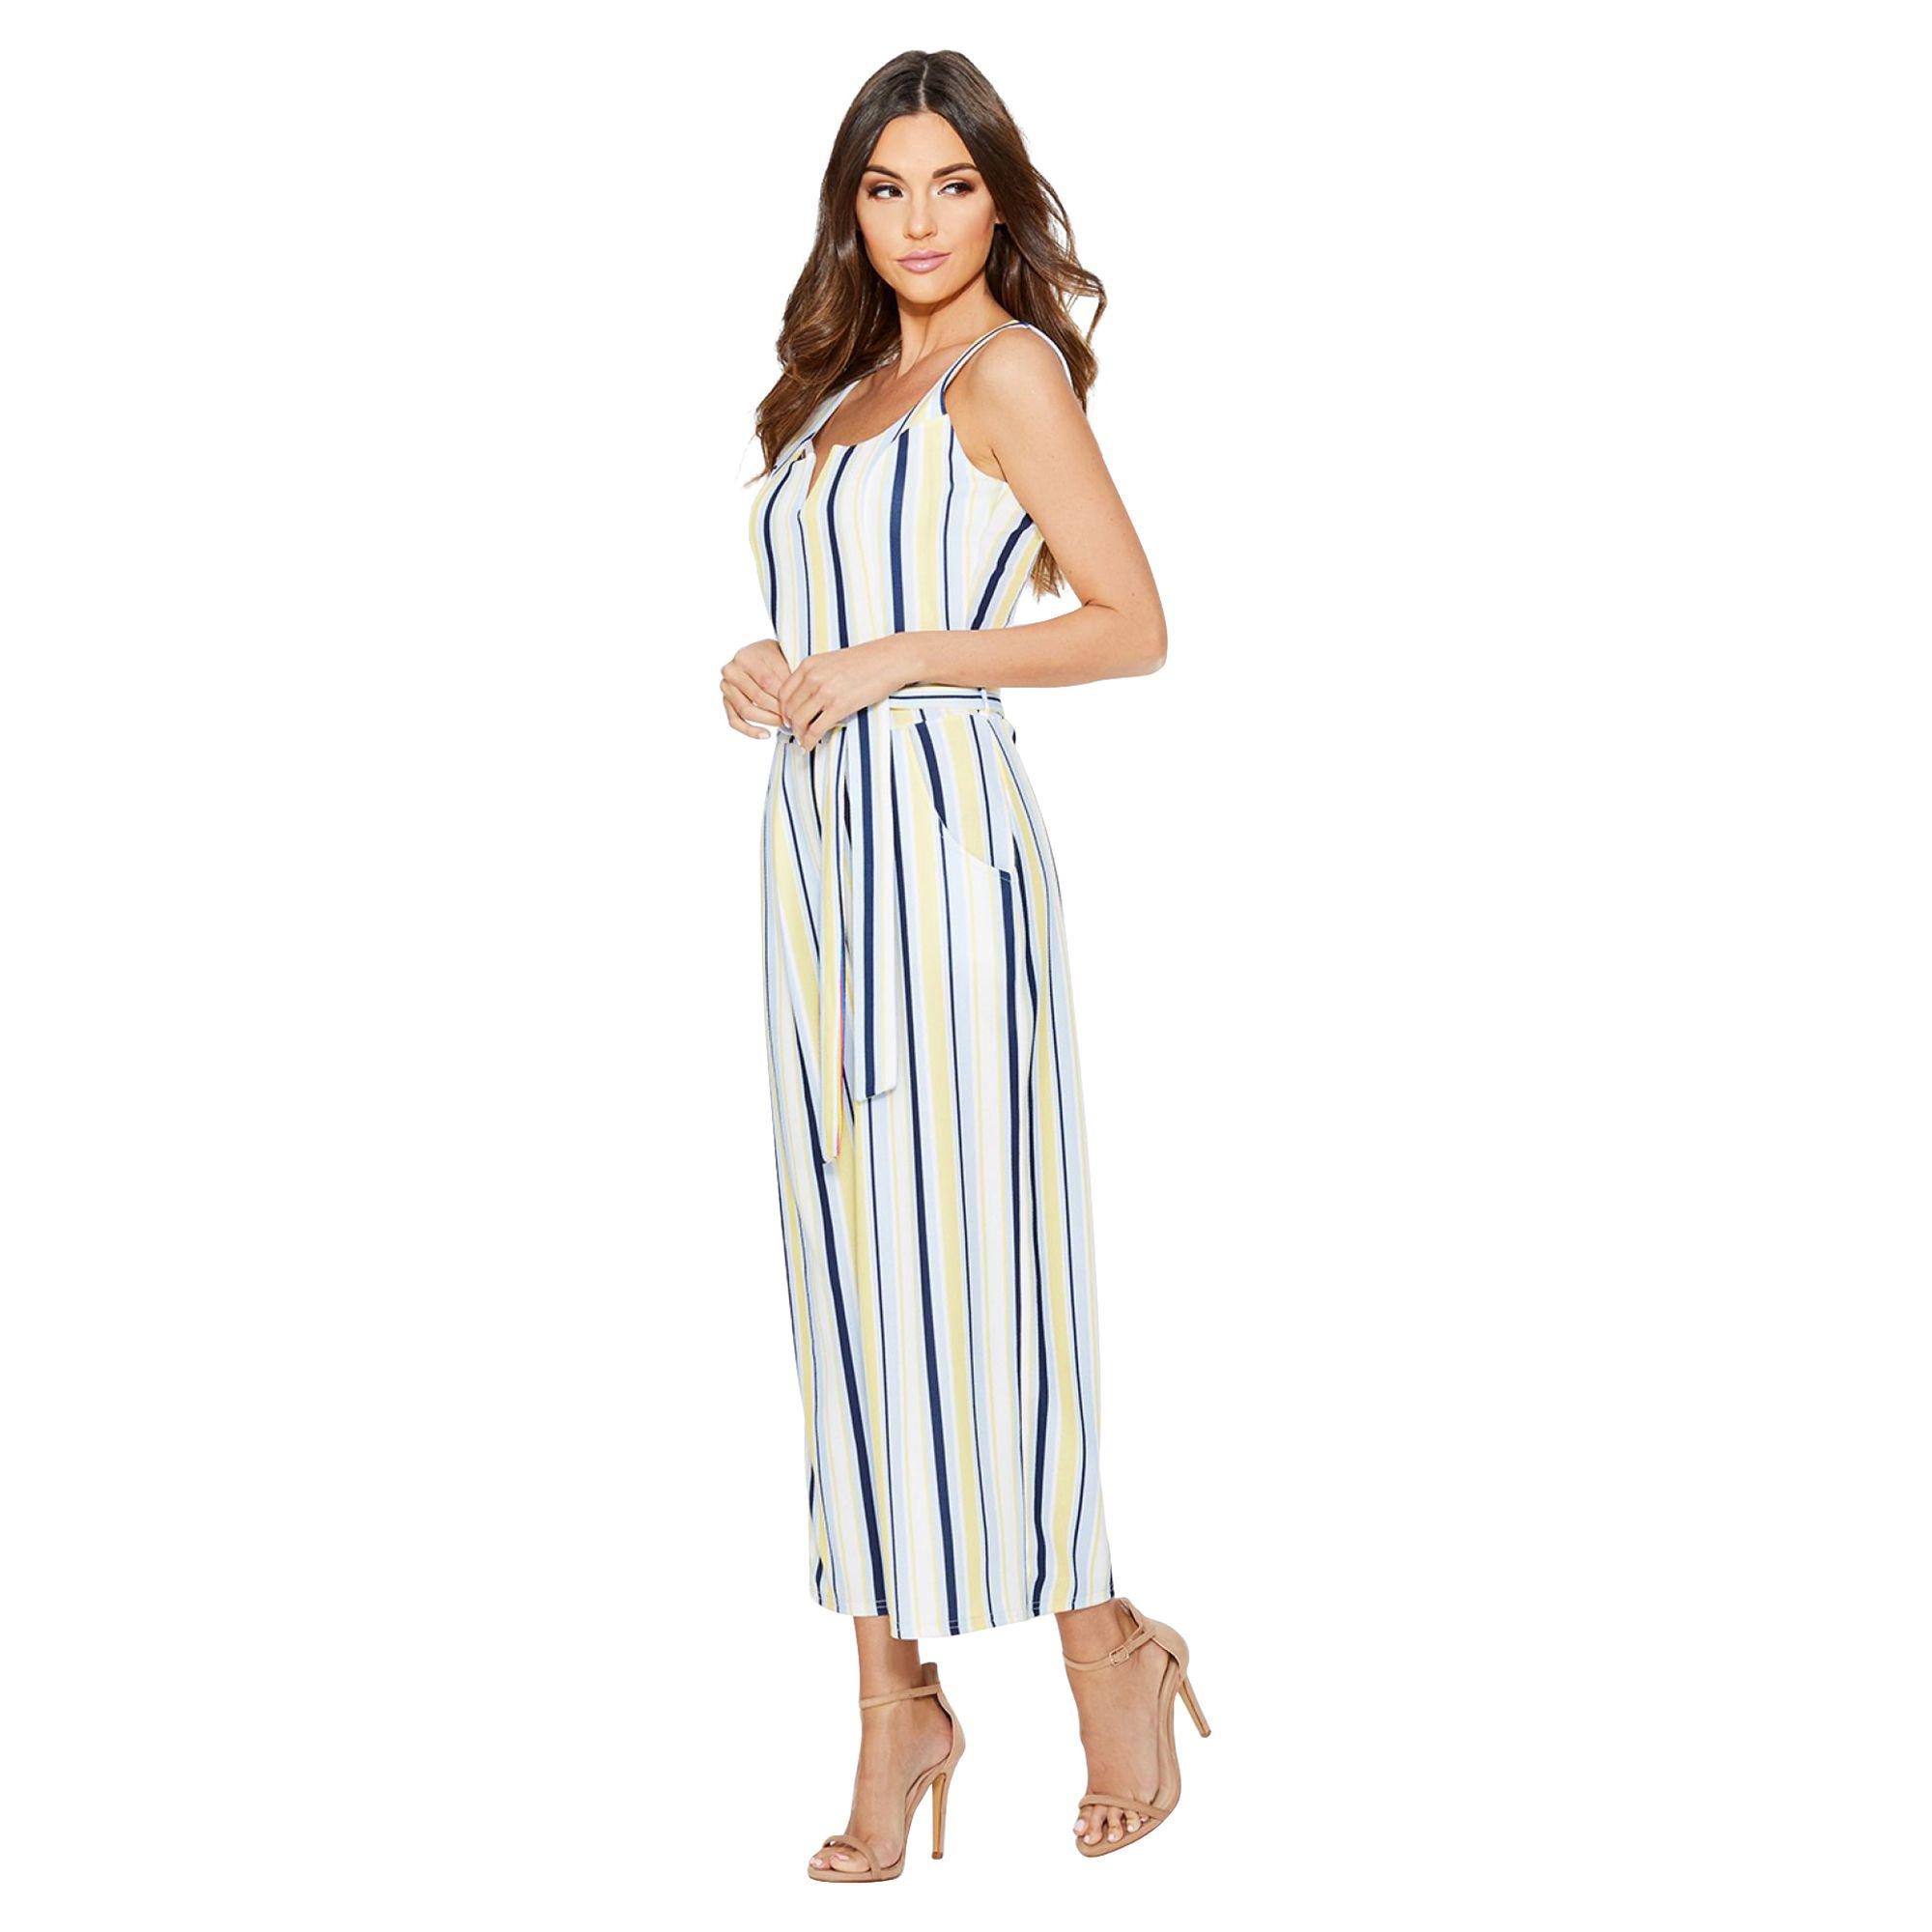 d43931f222 Quiz Cream Lemon And Blue Stripe Culotte Jumpsuit in Blue - Lyst